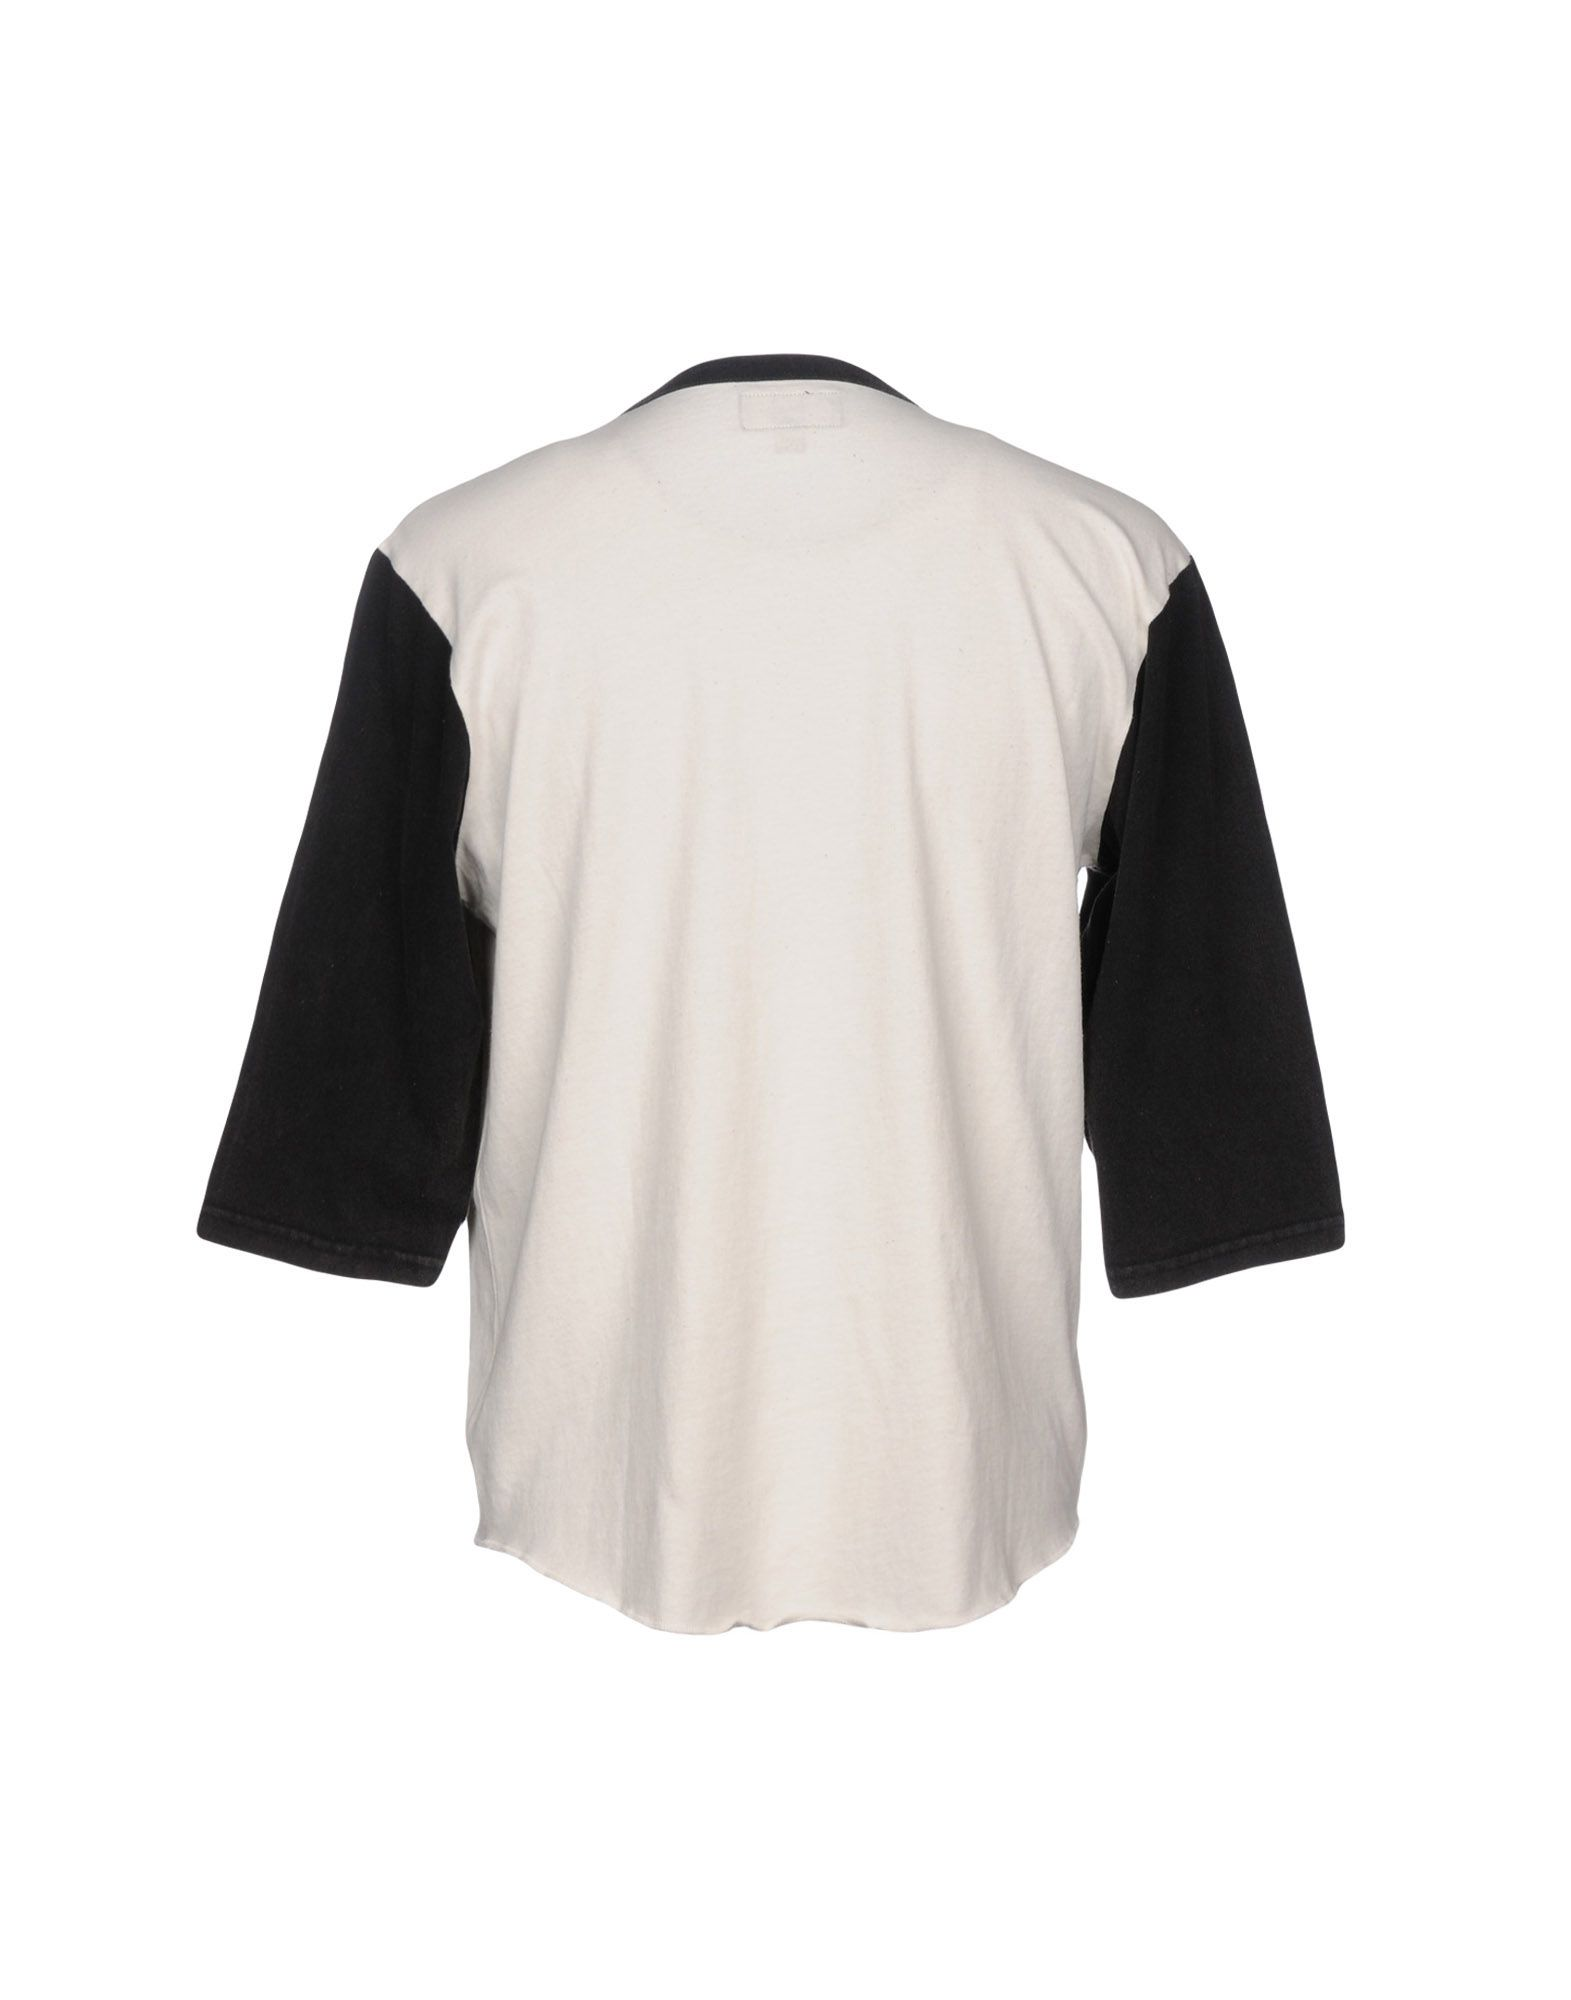 A buon mercato A buon buon buon mercato T-Shirt Brixton Uomo - 12167147RX 3a5e0e